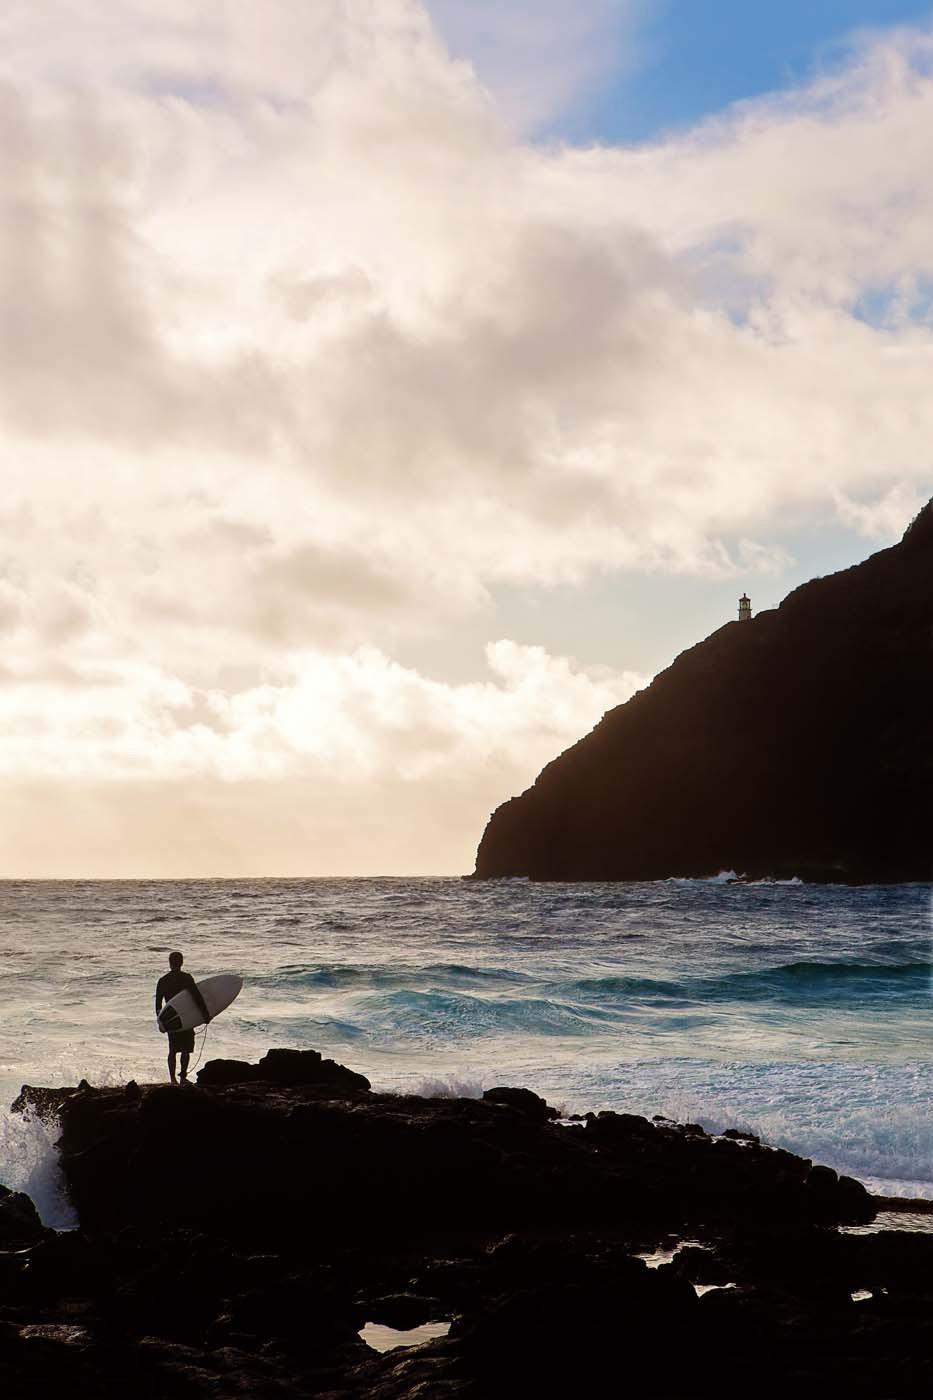 Makapu'u Surfer by Christy Johnson